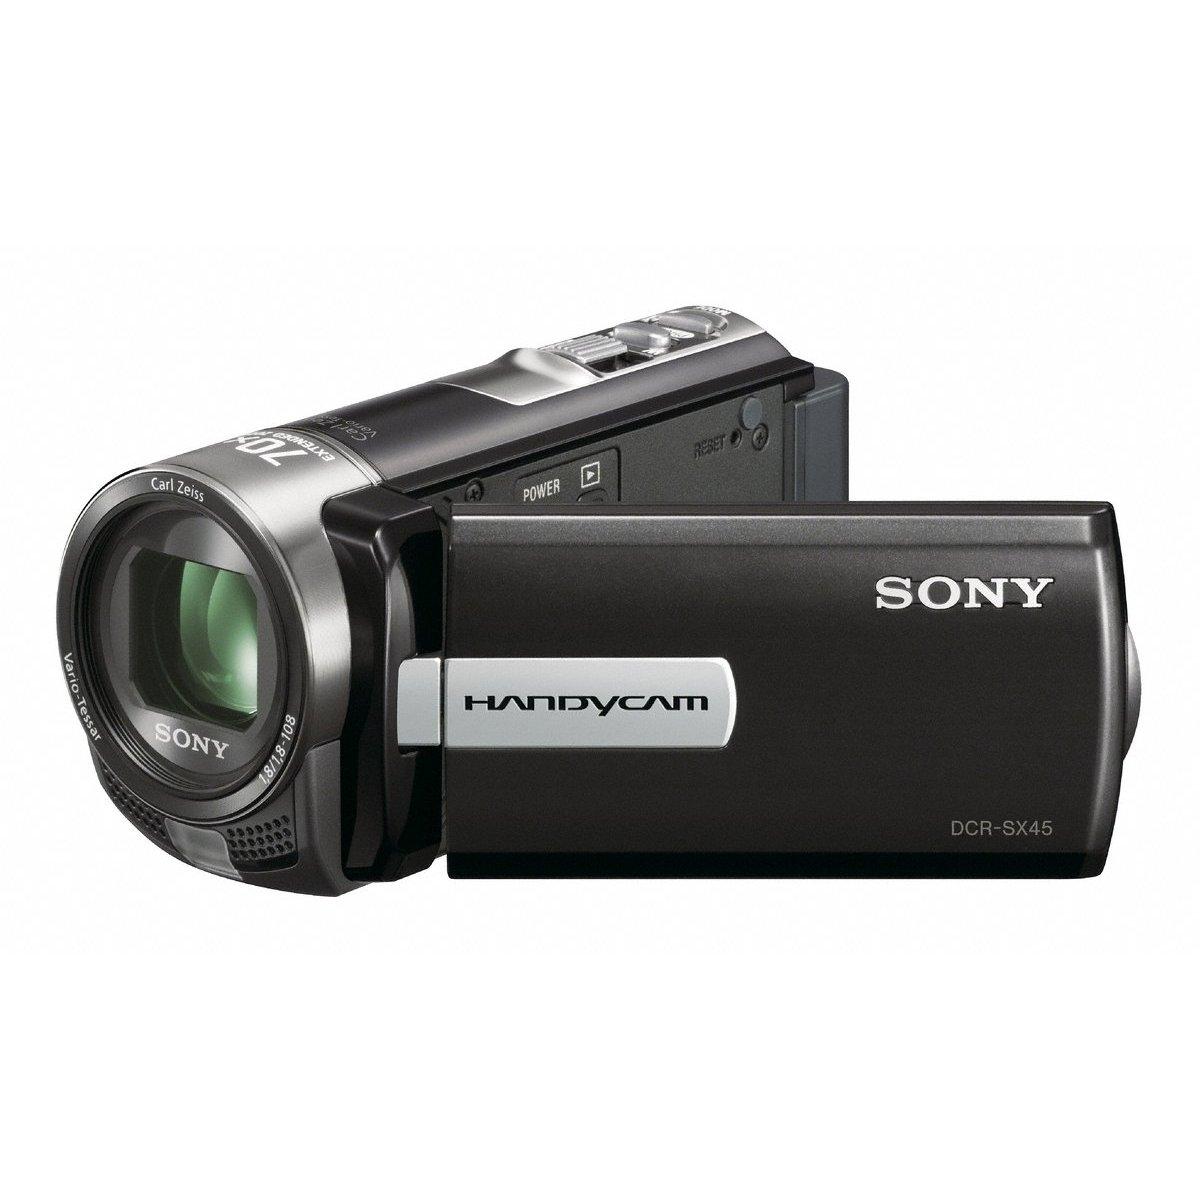 sony handycam installation software download